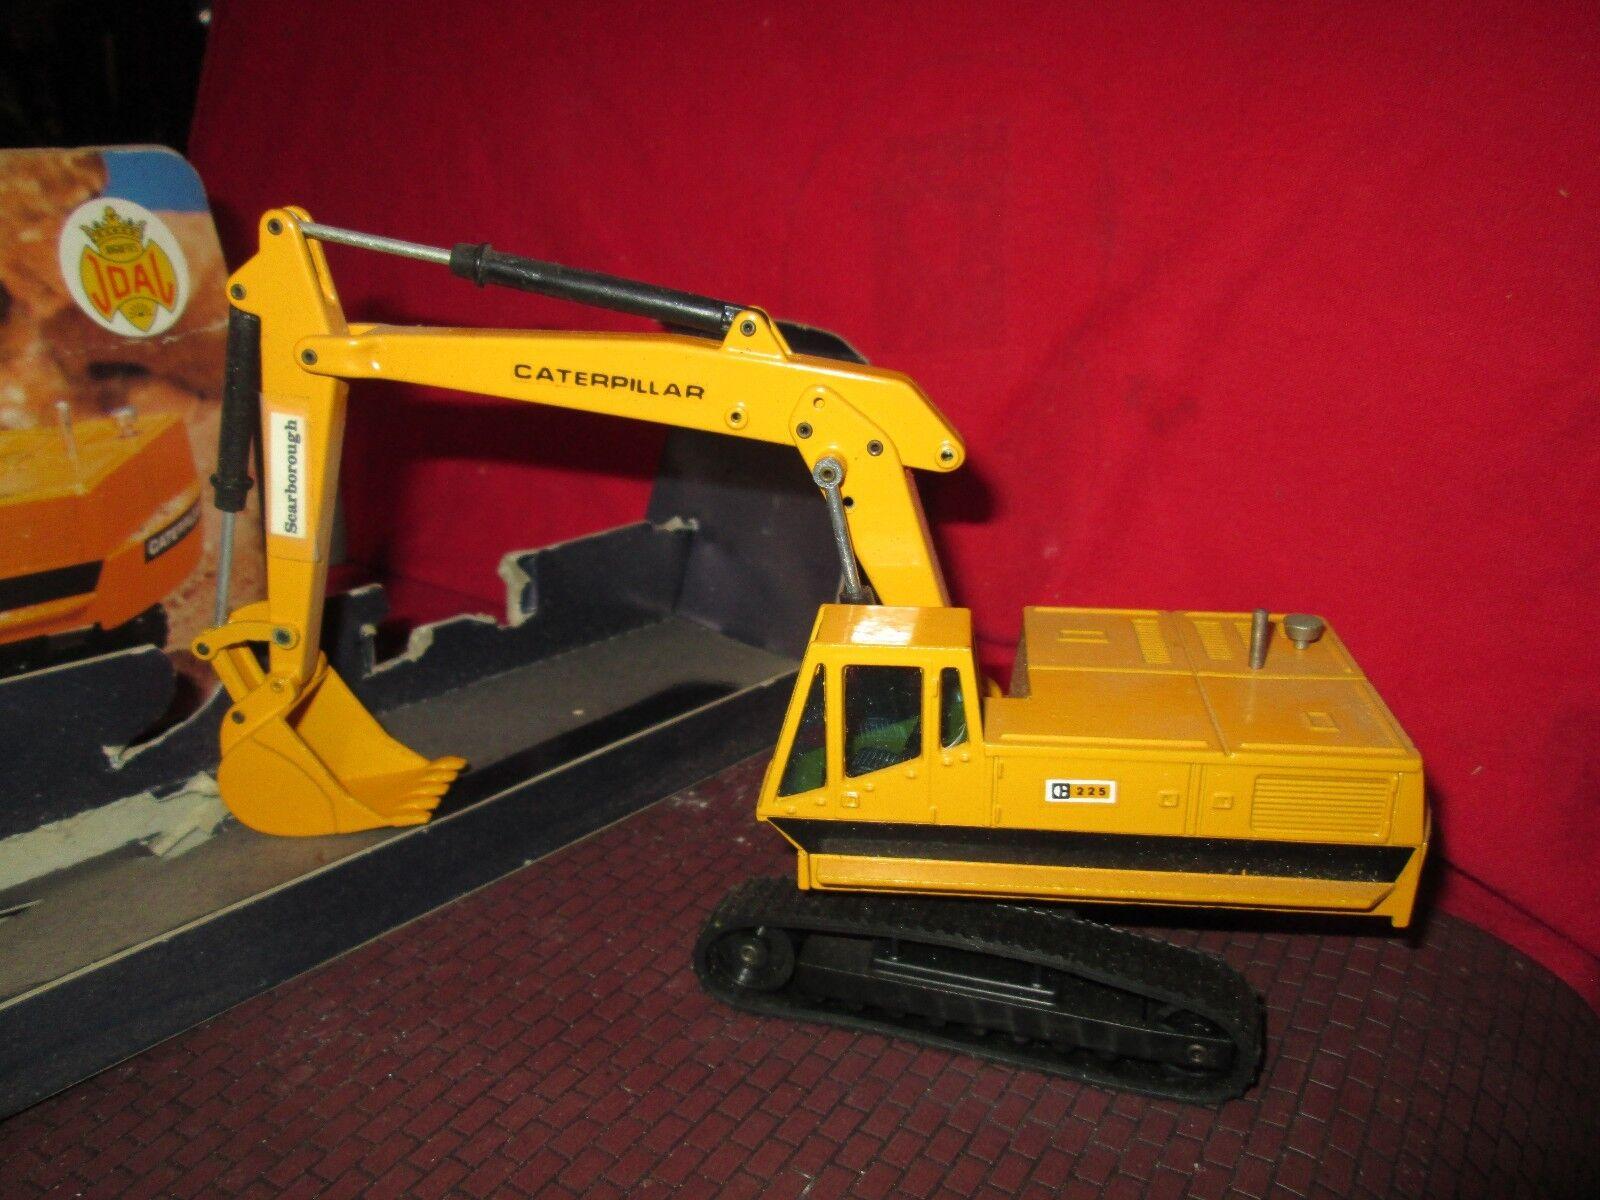 JOAL Die Cast Caterpillar Excavateur hydraulique 225 MADE IN SPAIN Box 1 70  216